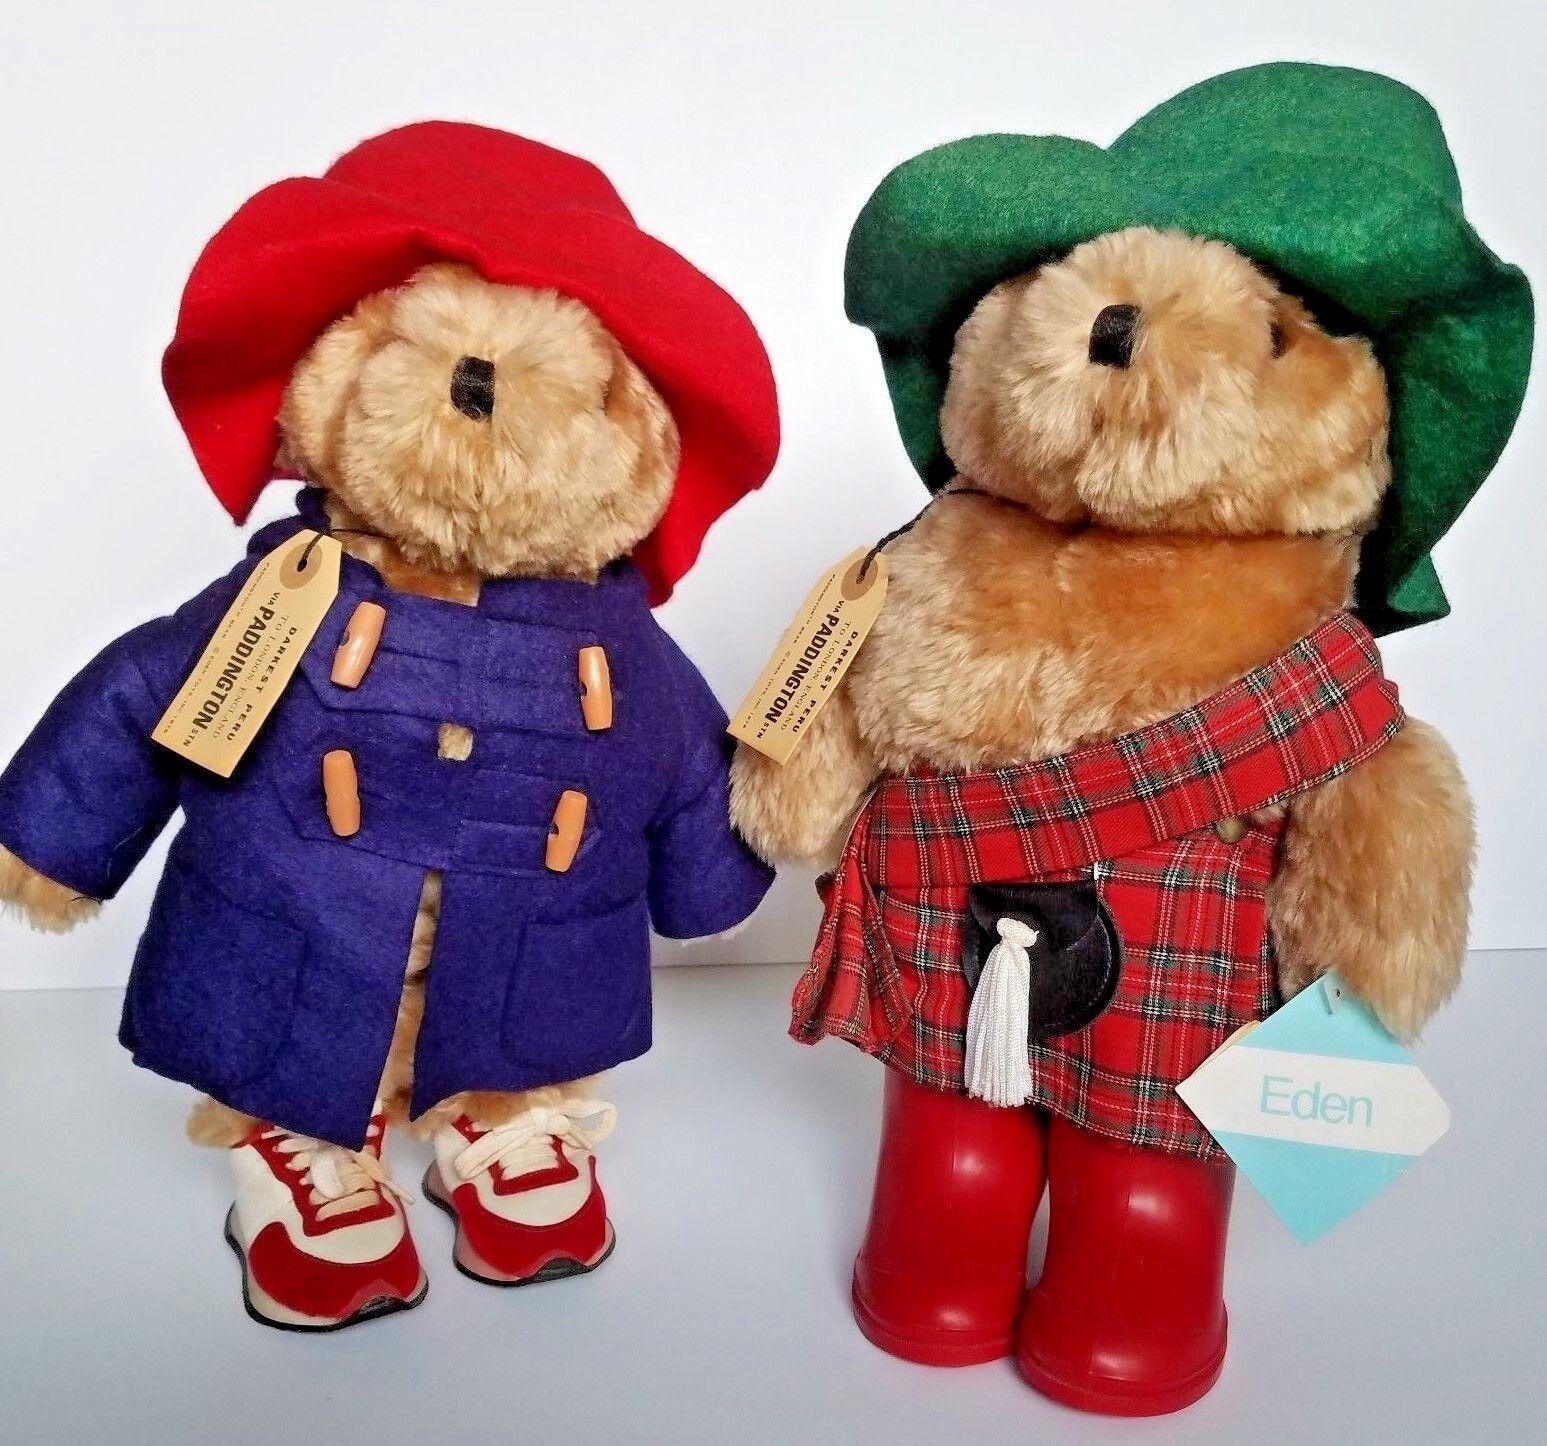 Vintage Lot of 2 Plush Paddington Bear Dolls Original Scottish Outfits Clothes